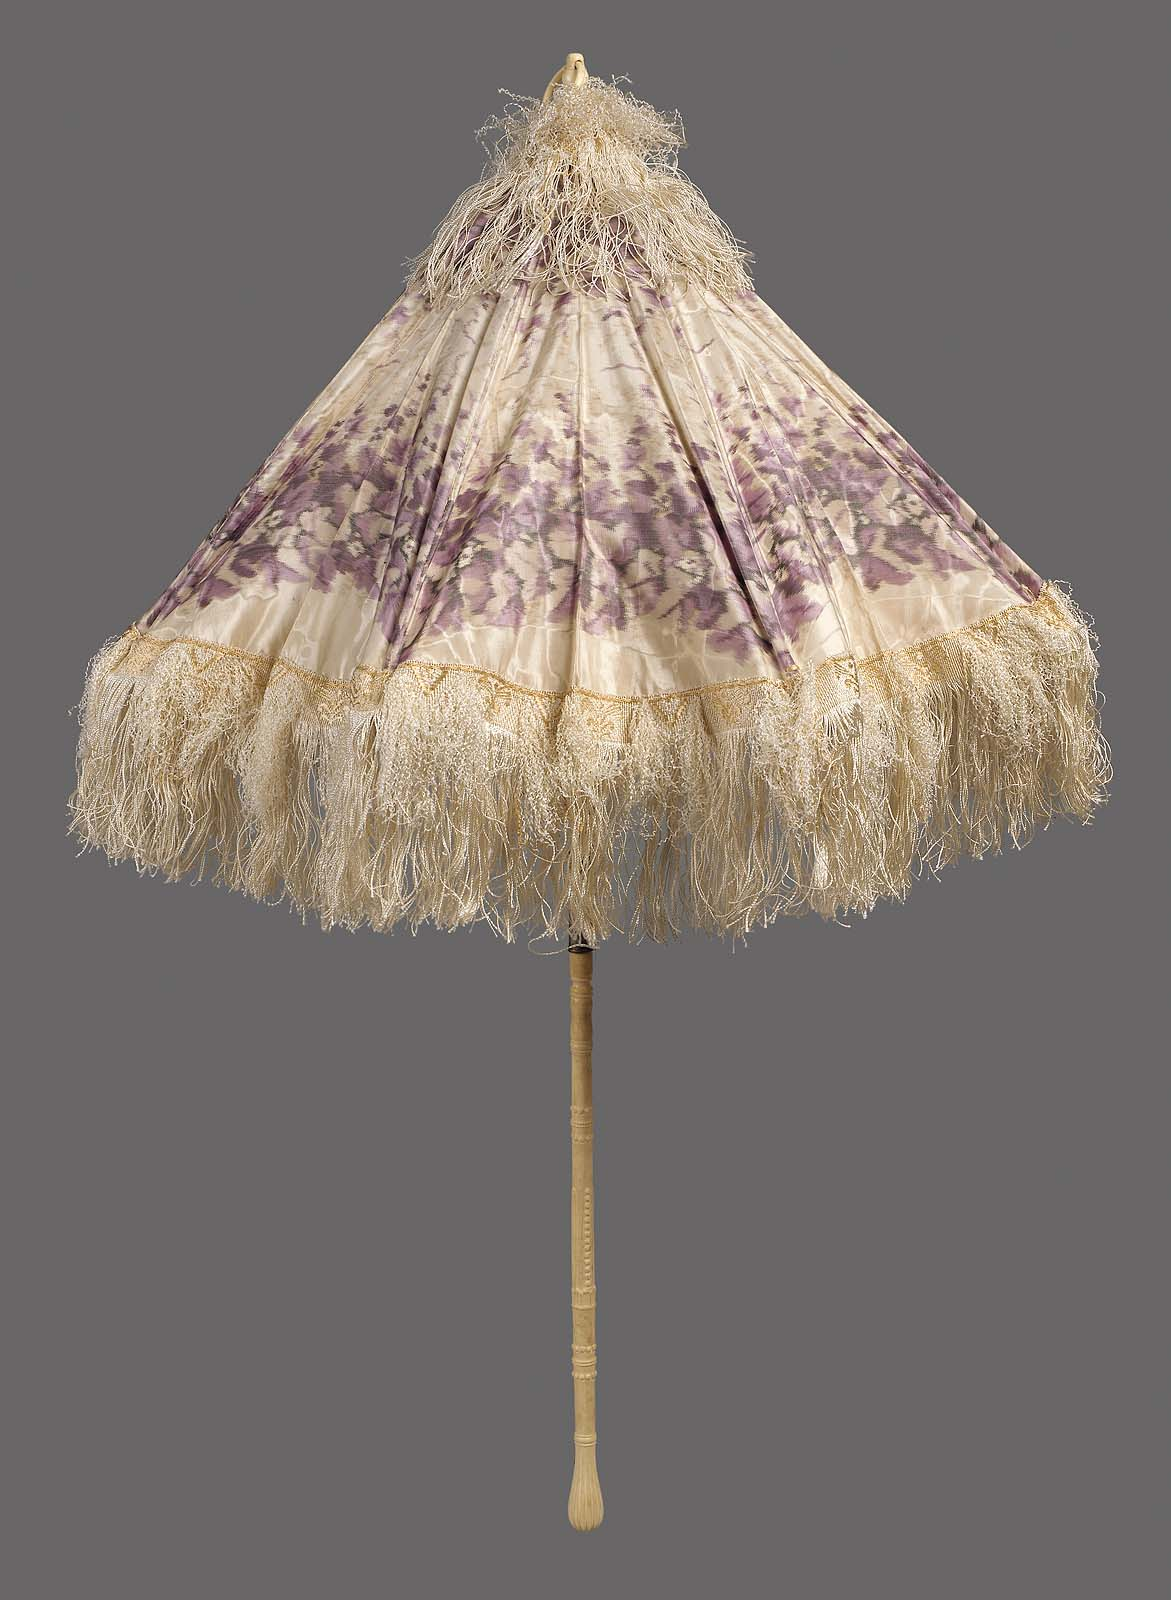 1840 1865 american parasol of moire silk taffeta chine with ikatted design of purple vegetative motif on white via mfa boston